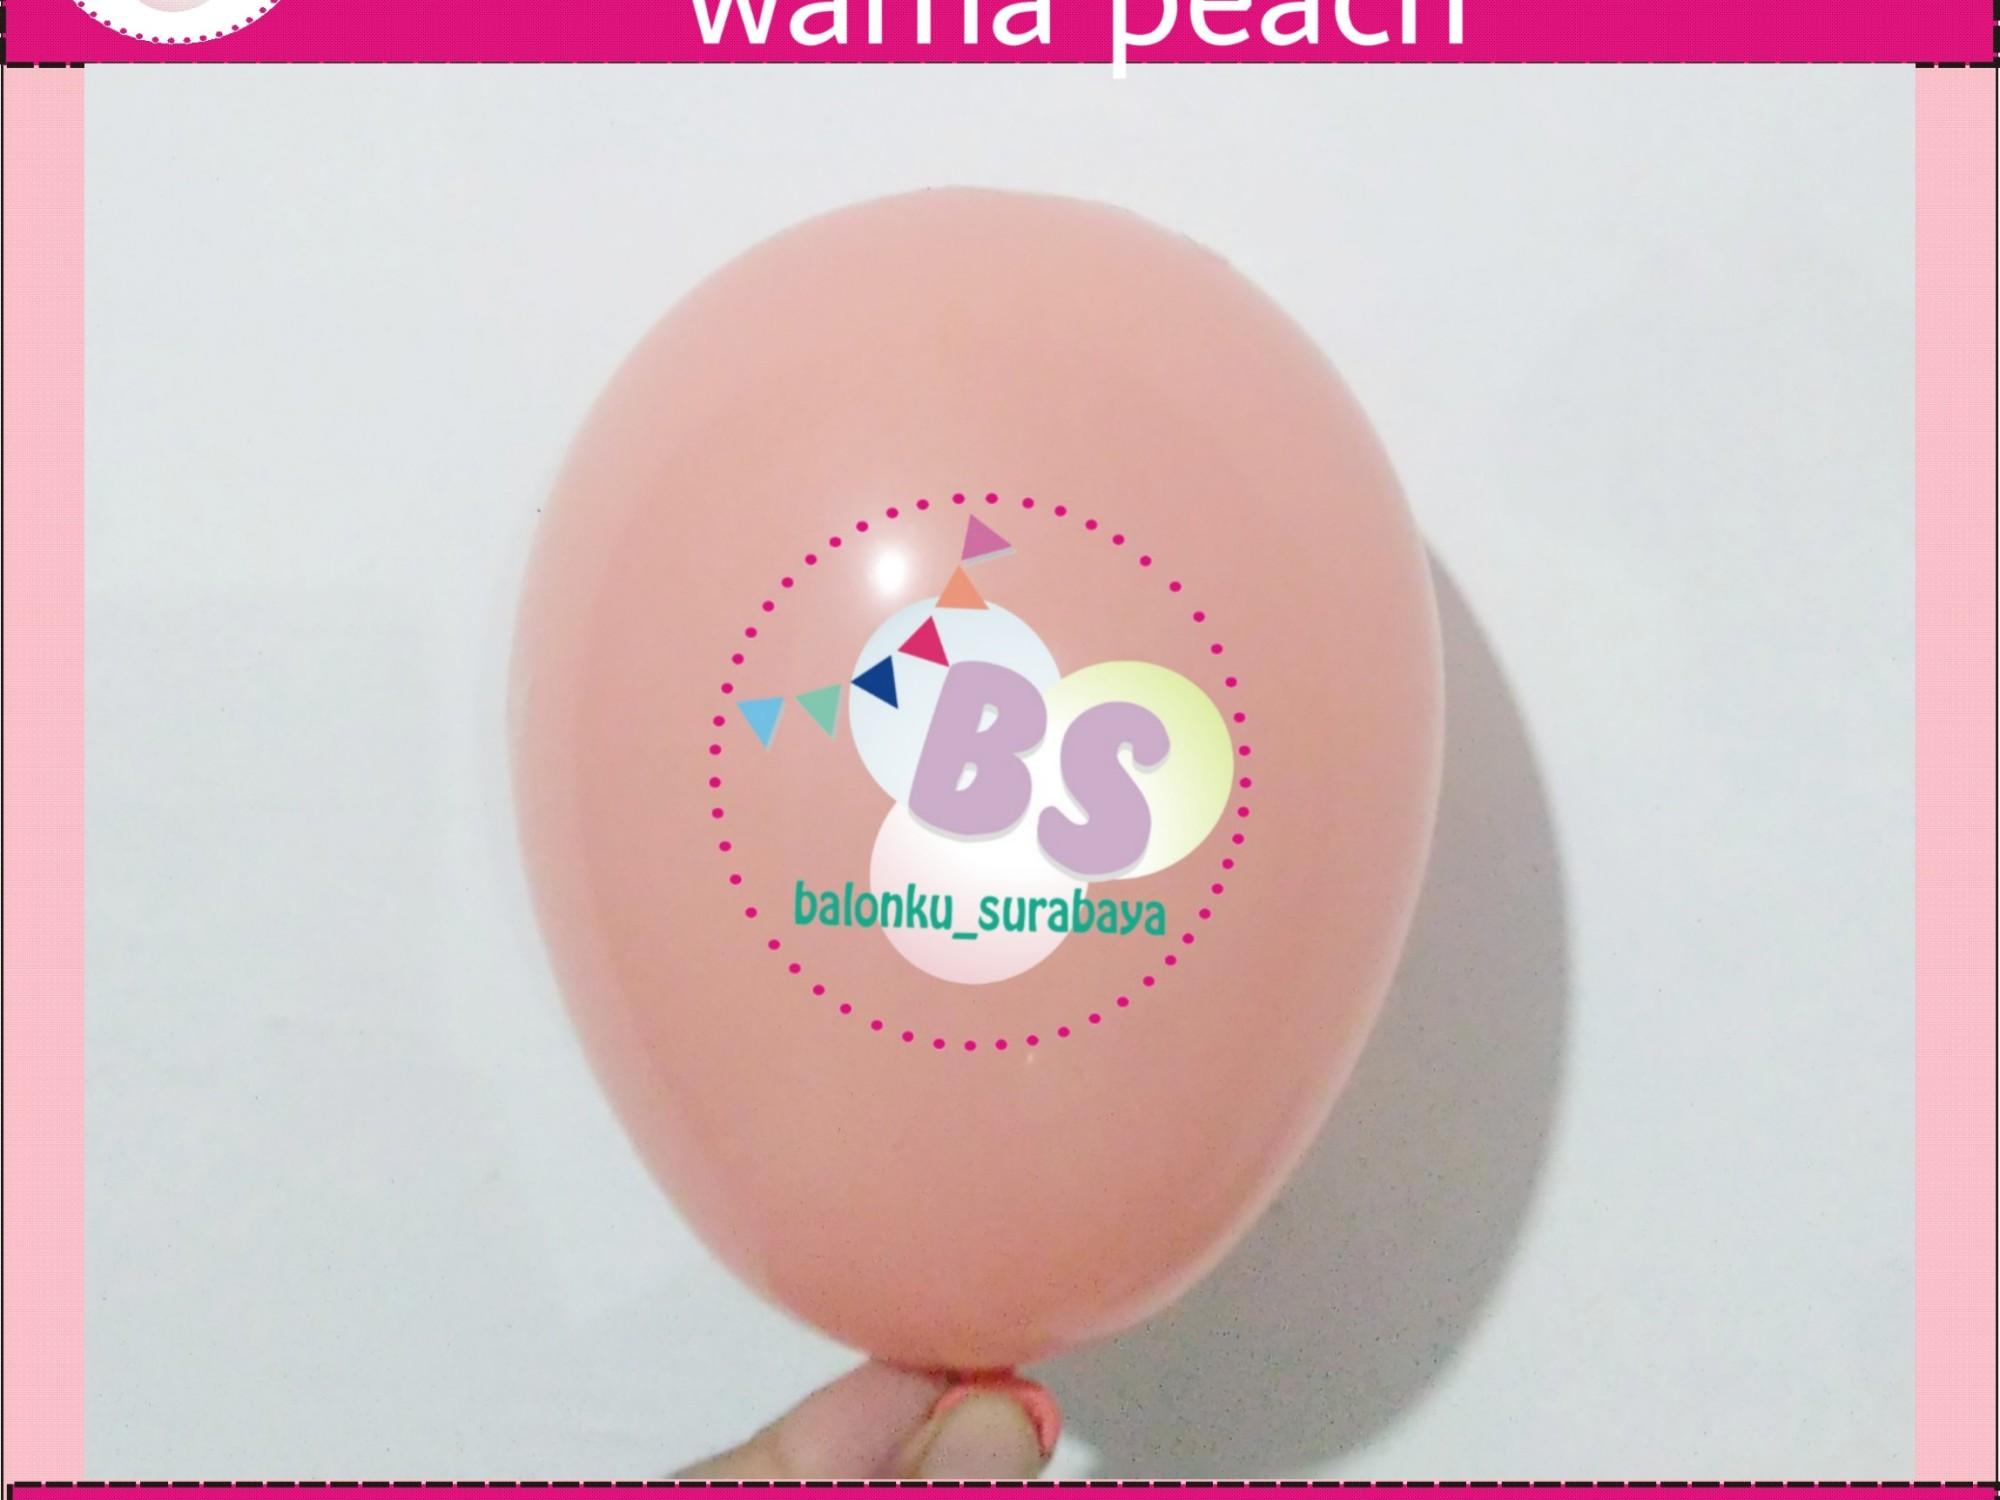 jual balon latex 5 inch peach, BAlon Gas,Bunga dekorasi,Rangkaian bunga artificial, Buket bunga, buket bunga mawar, harga buket bunga,Balon sablon, balon Printing, balon promosi, , Perlengkapan ulang tahun, Balon latex , balon doff, balon latex, balon doff merah, balon natal, balon agustusan, balon dekorasi, balonku Surabaya, 085733133529